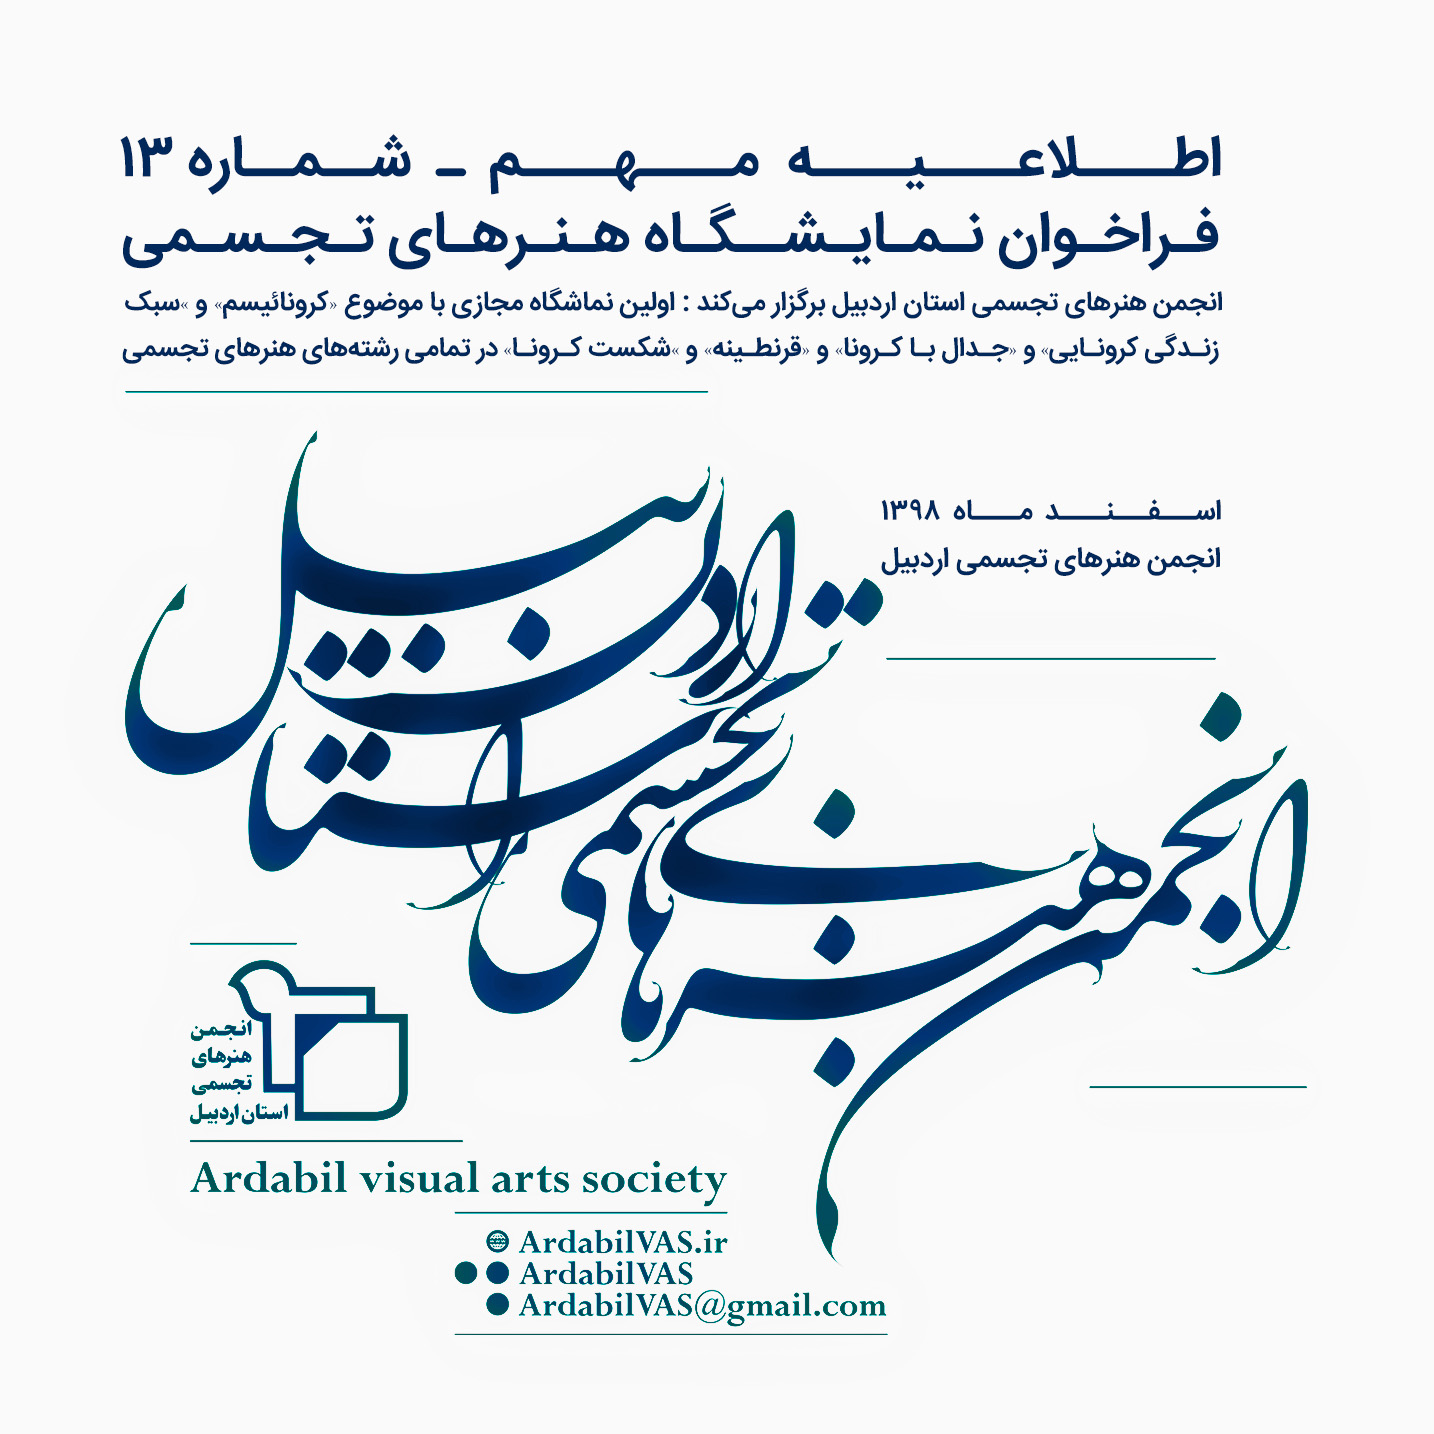 Photo of اطلاعیه شماره ۱۳ ـ فراخوان نمایشگاه مجازی با موضوع کرونا